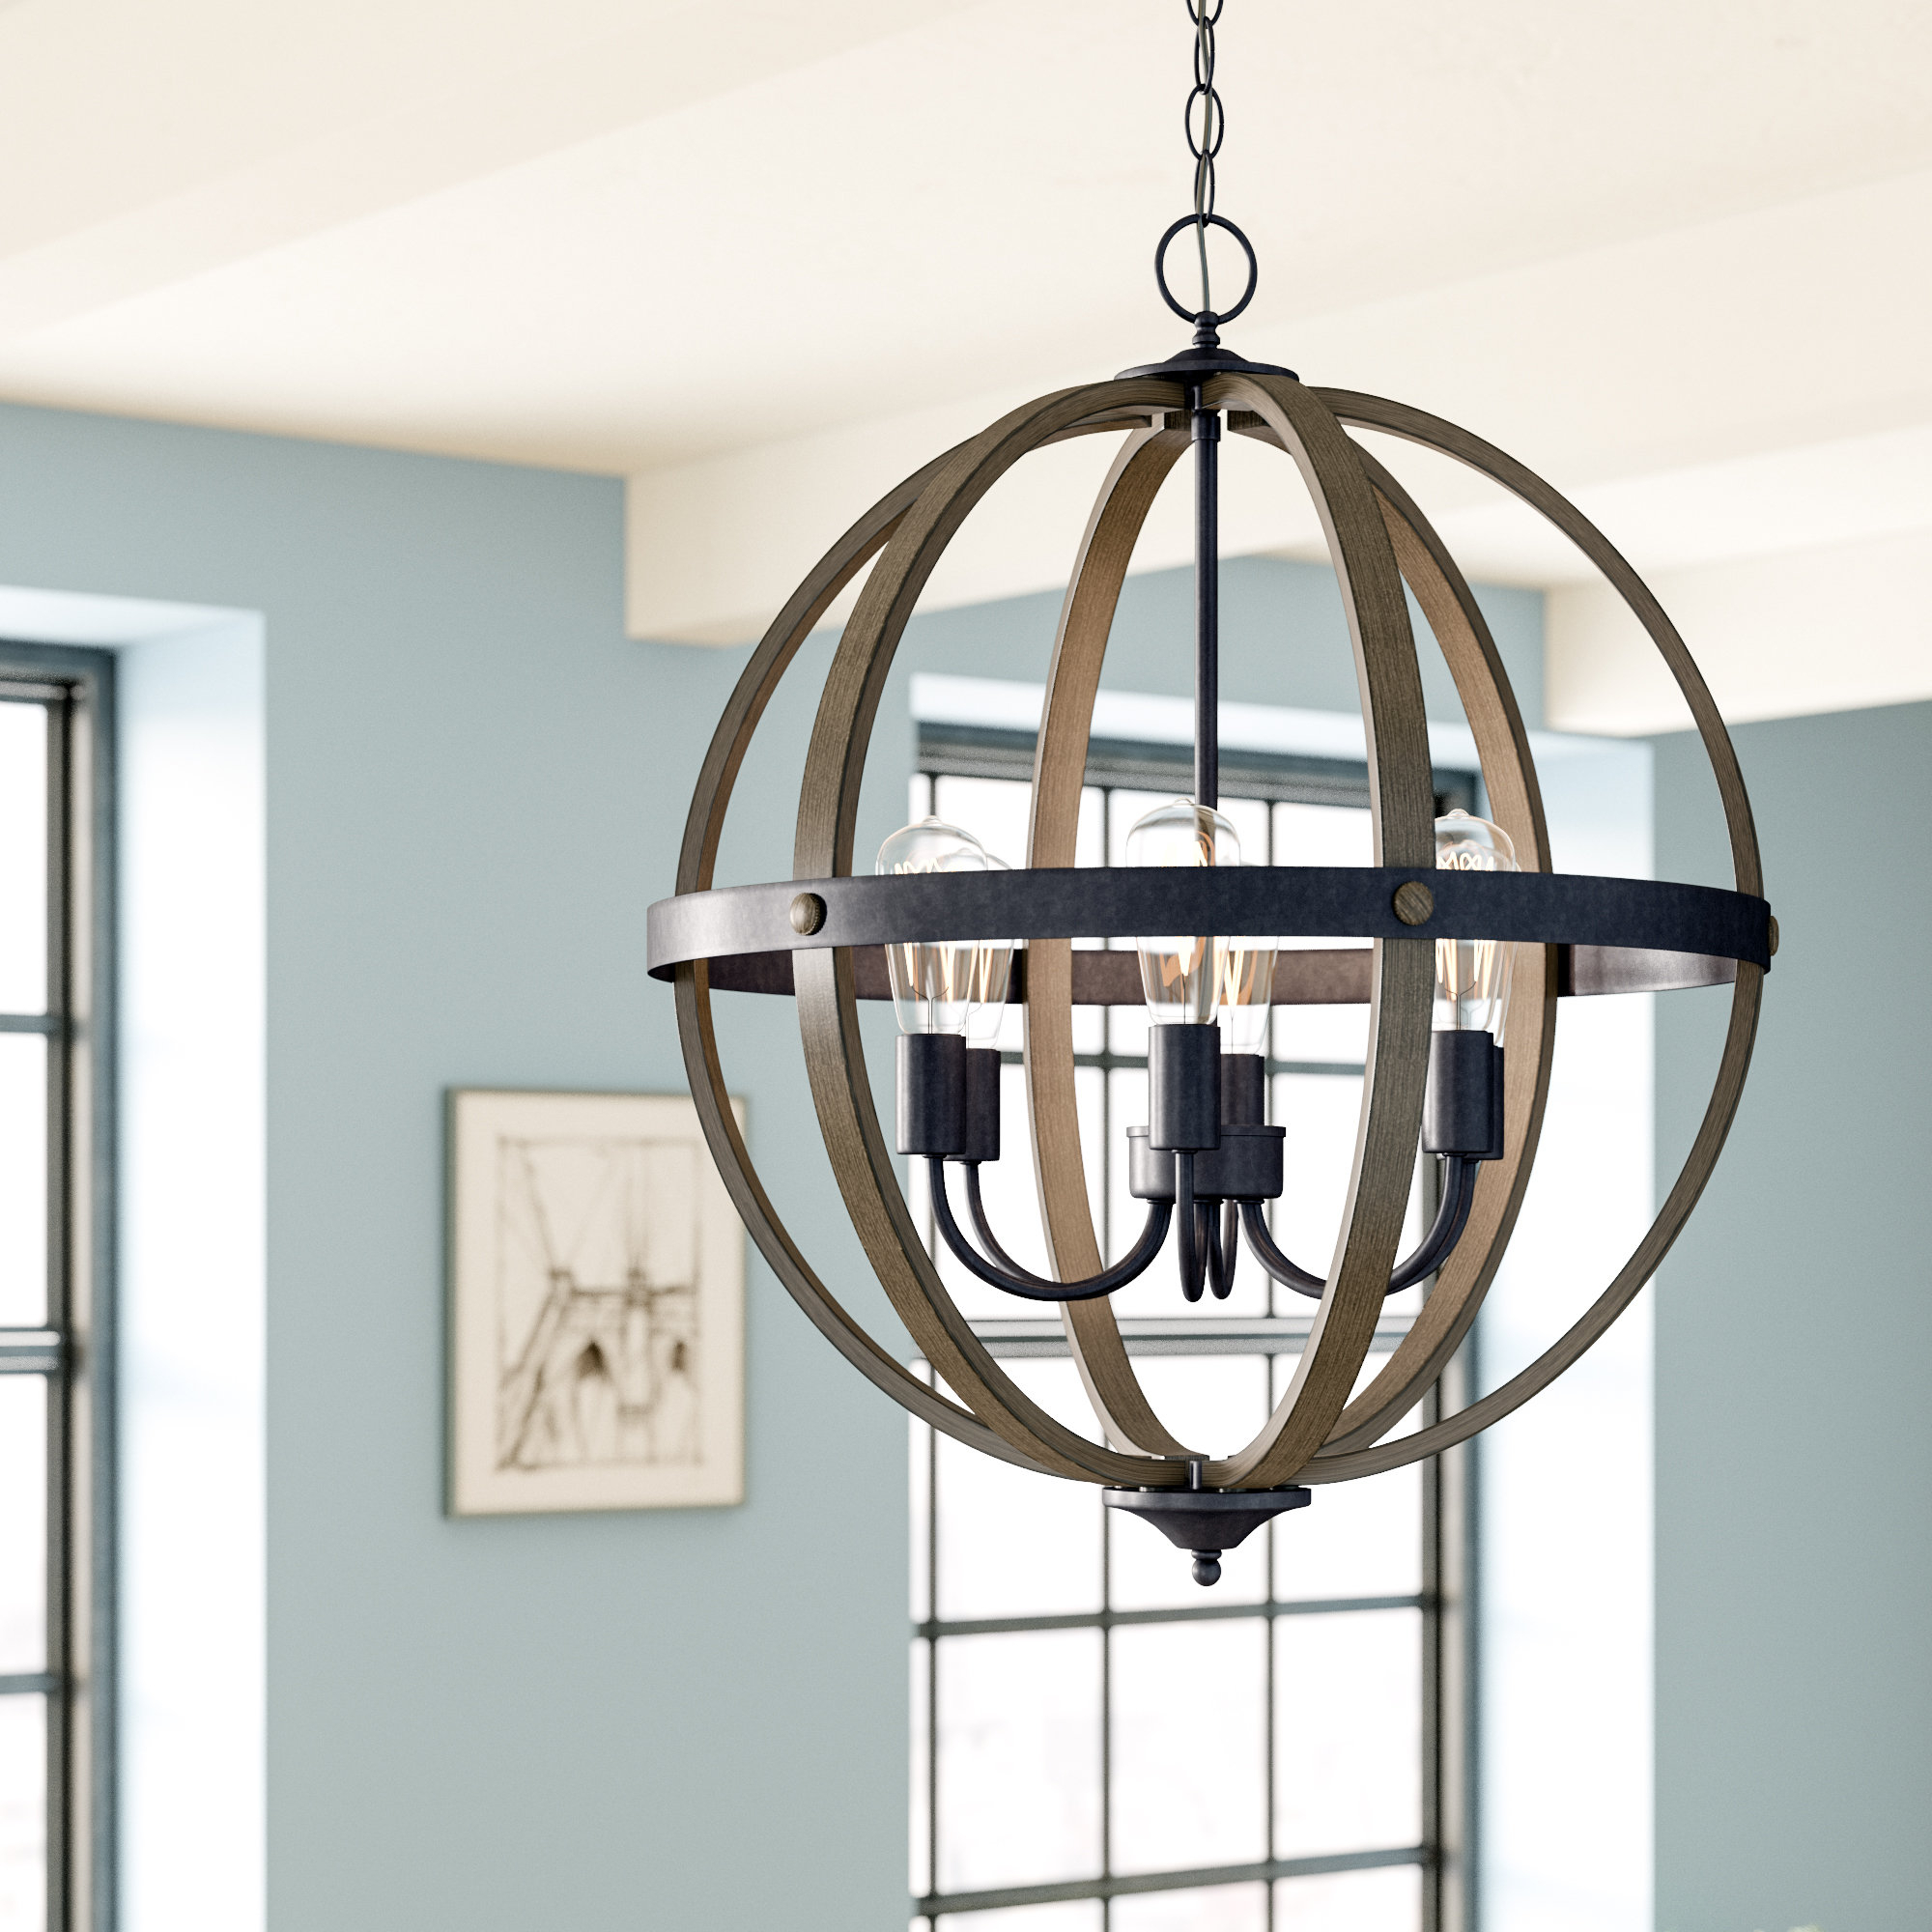 Kathrina 6 Light Globe Chandelier Pertaining To Filipe Globe Chandeliers (Gallery 6 of 30)